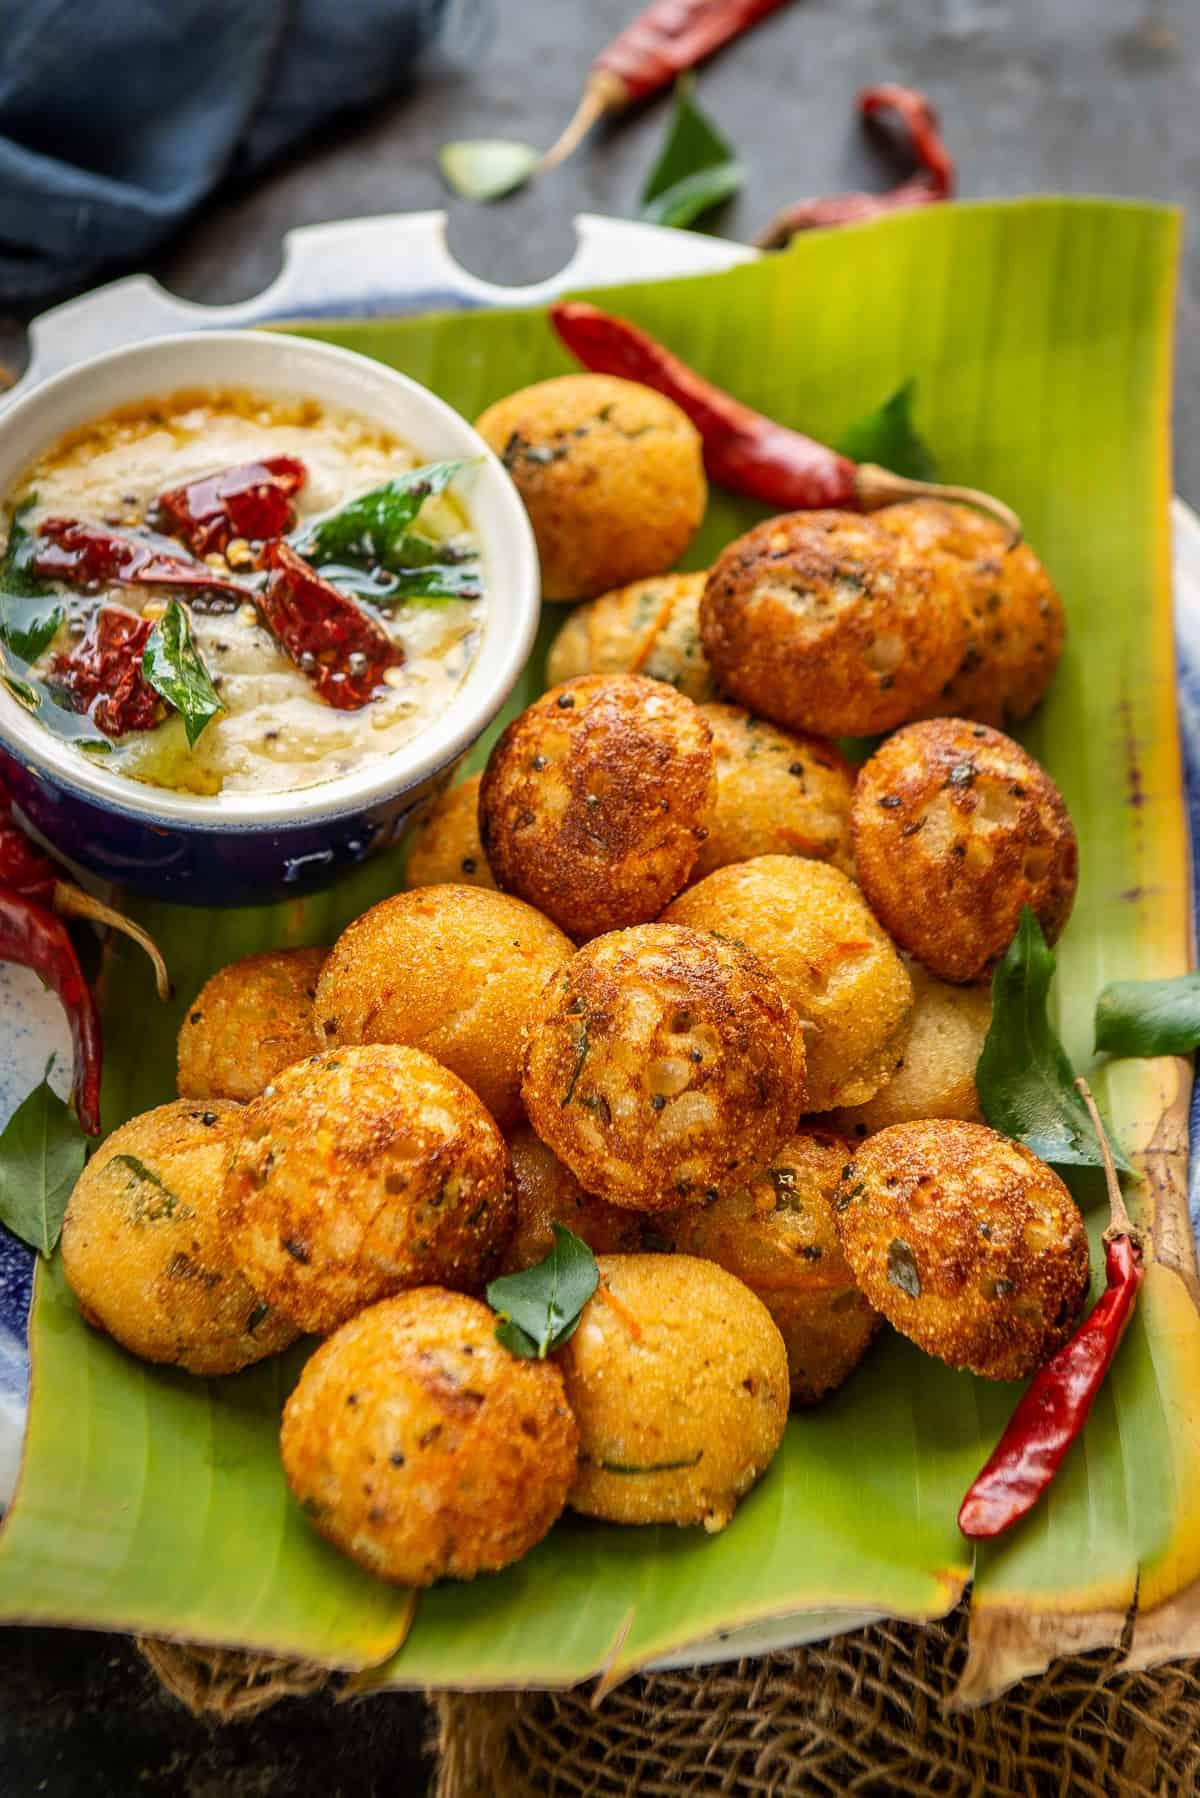 Rava Appe or Rava Paniyaram served on a plate.